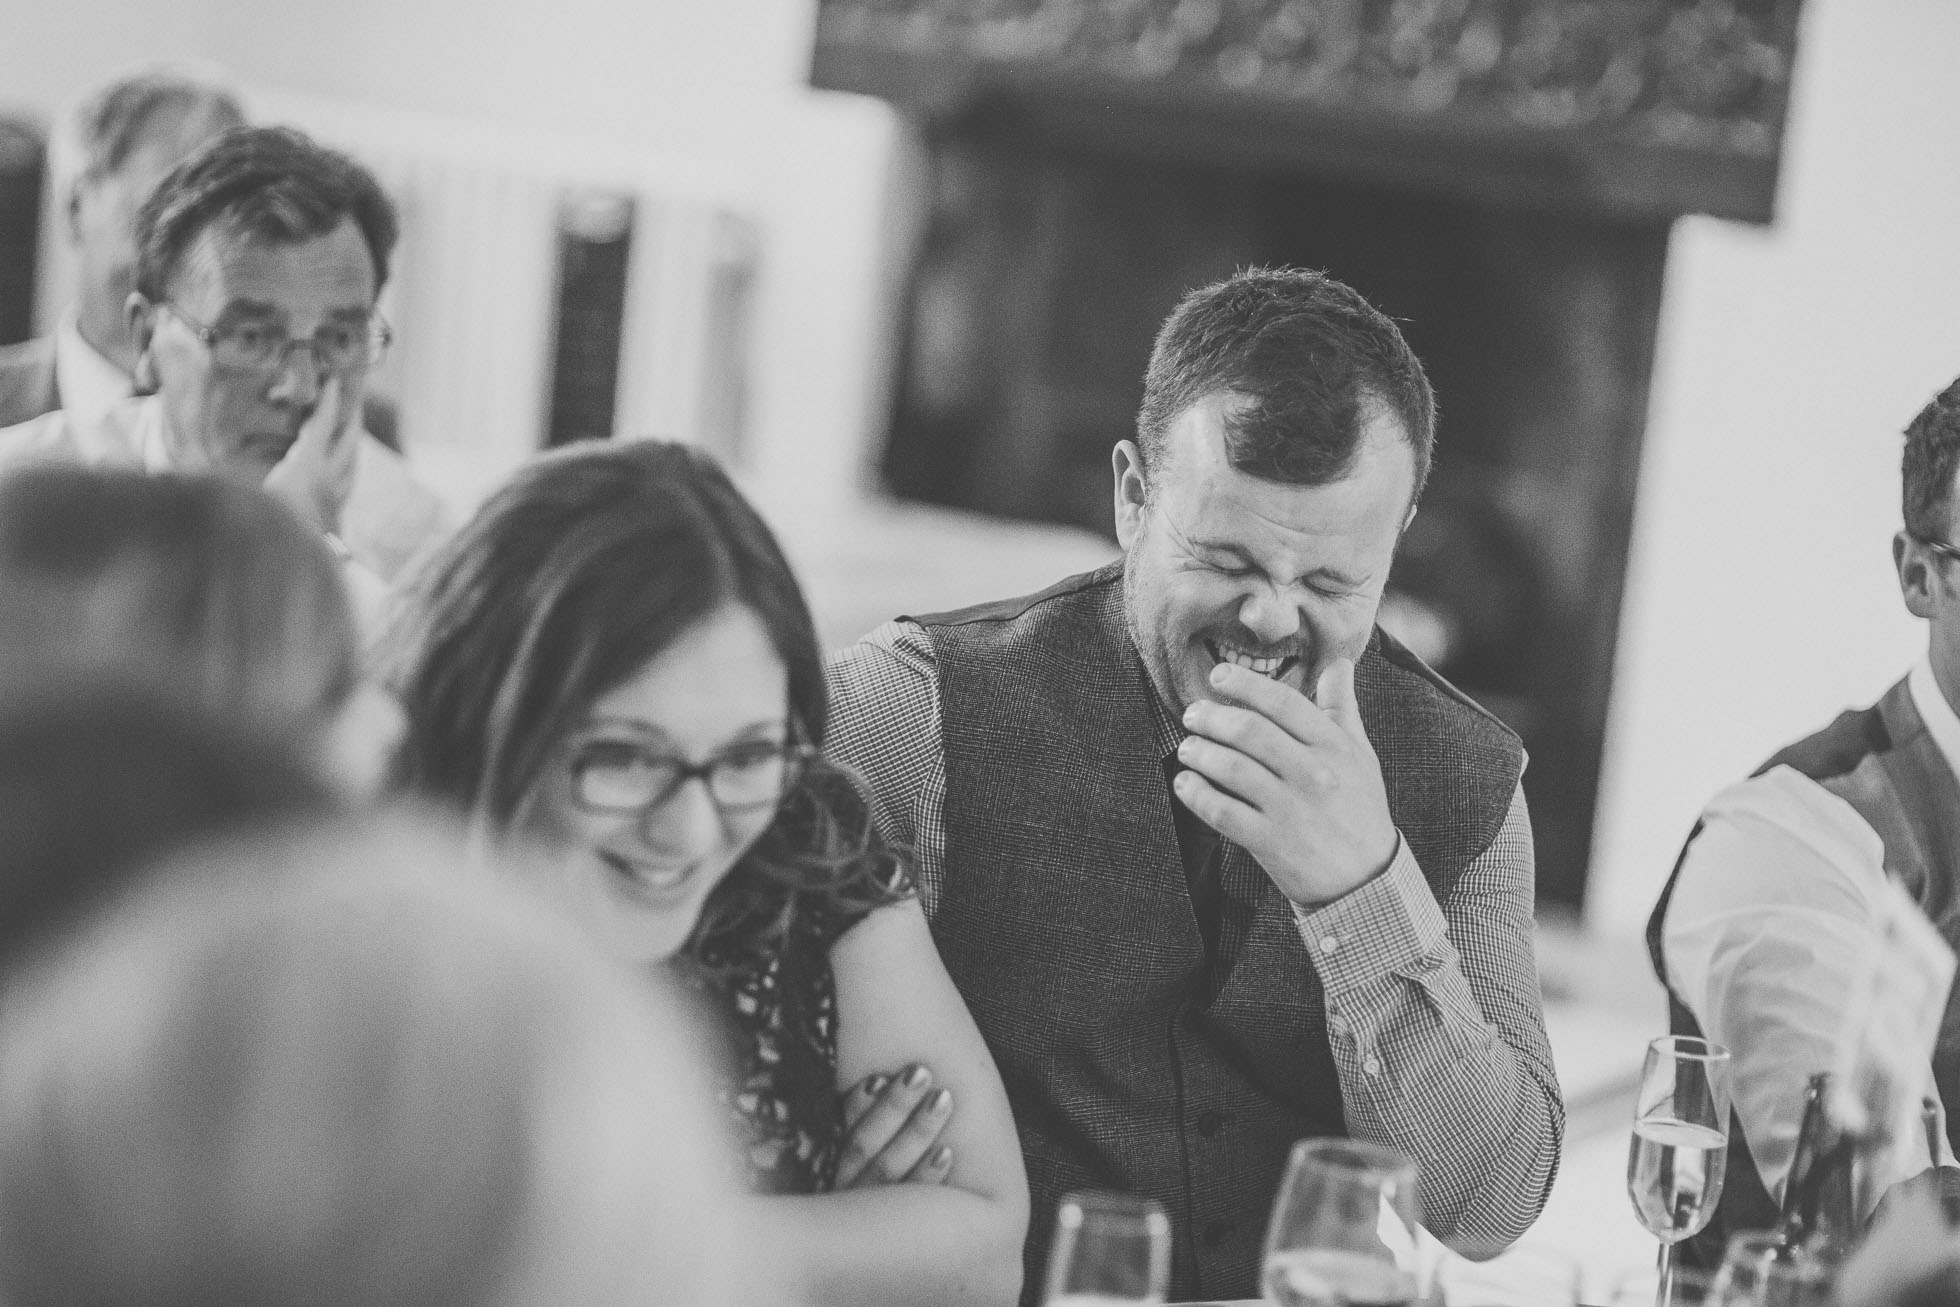 denton-hall-wedding-photographer-63.jpg